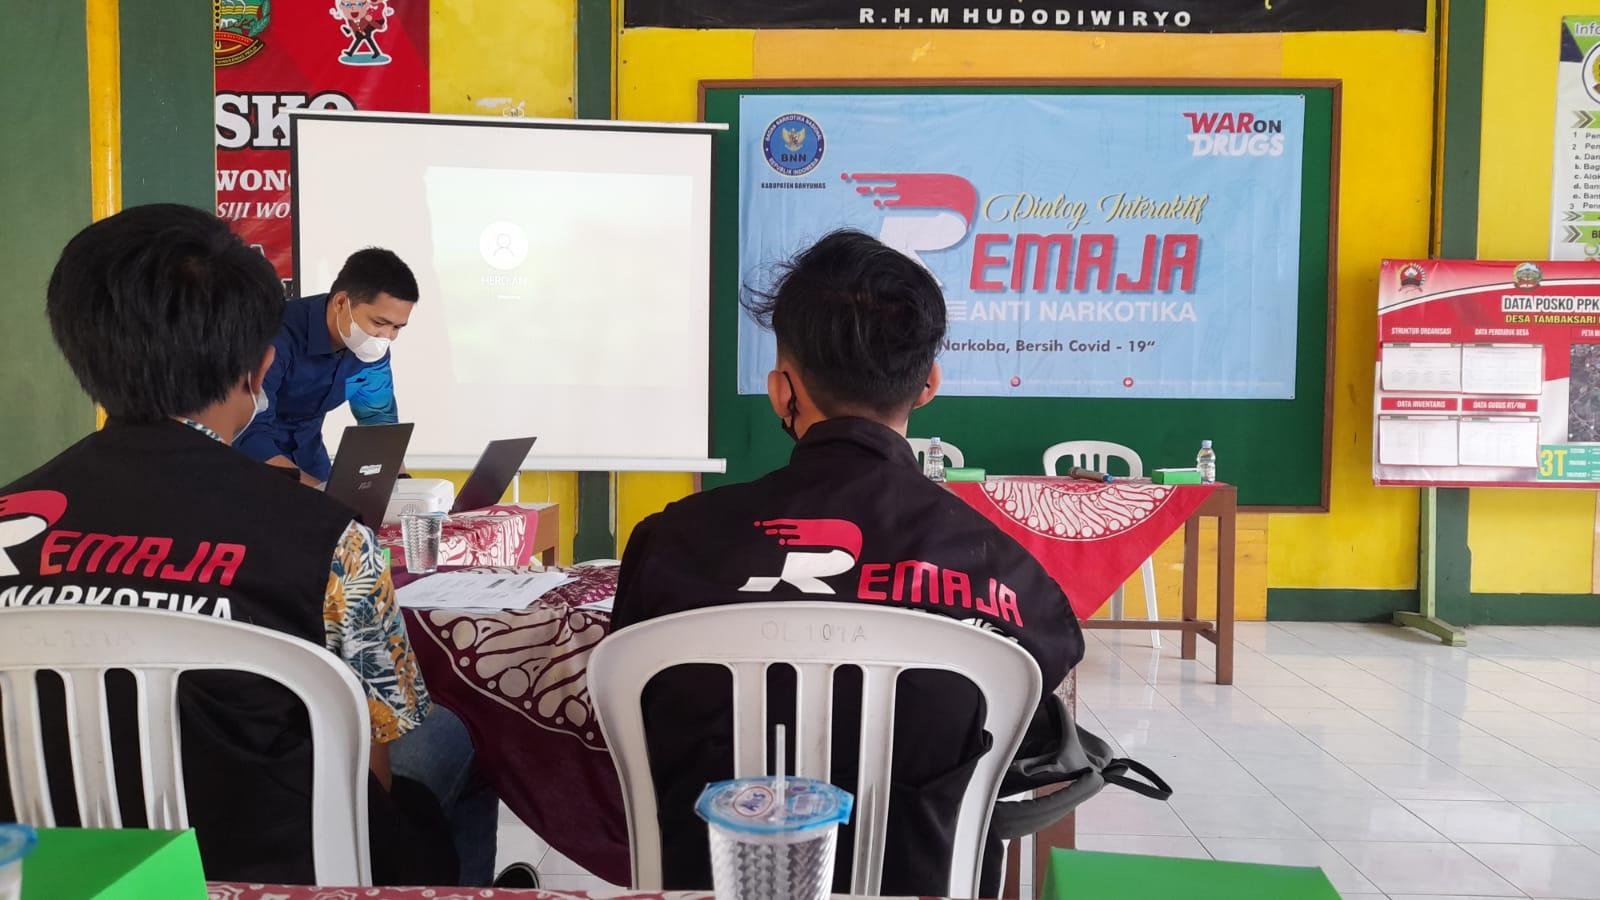 Program Pilot Project Desa Bersinar, BNNK Banyumas Tunjuk Tiga Siswa MAN 2 Banyumas Pada Kegiatan Dialog Interaktif Remaja Anti Narkotika